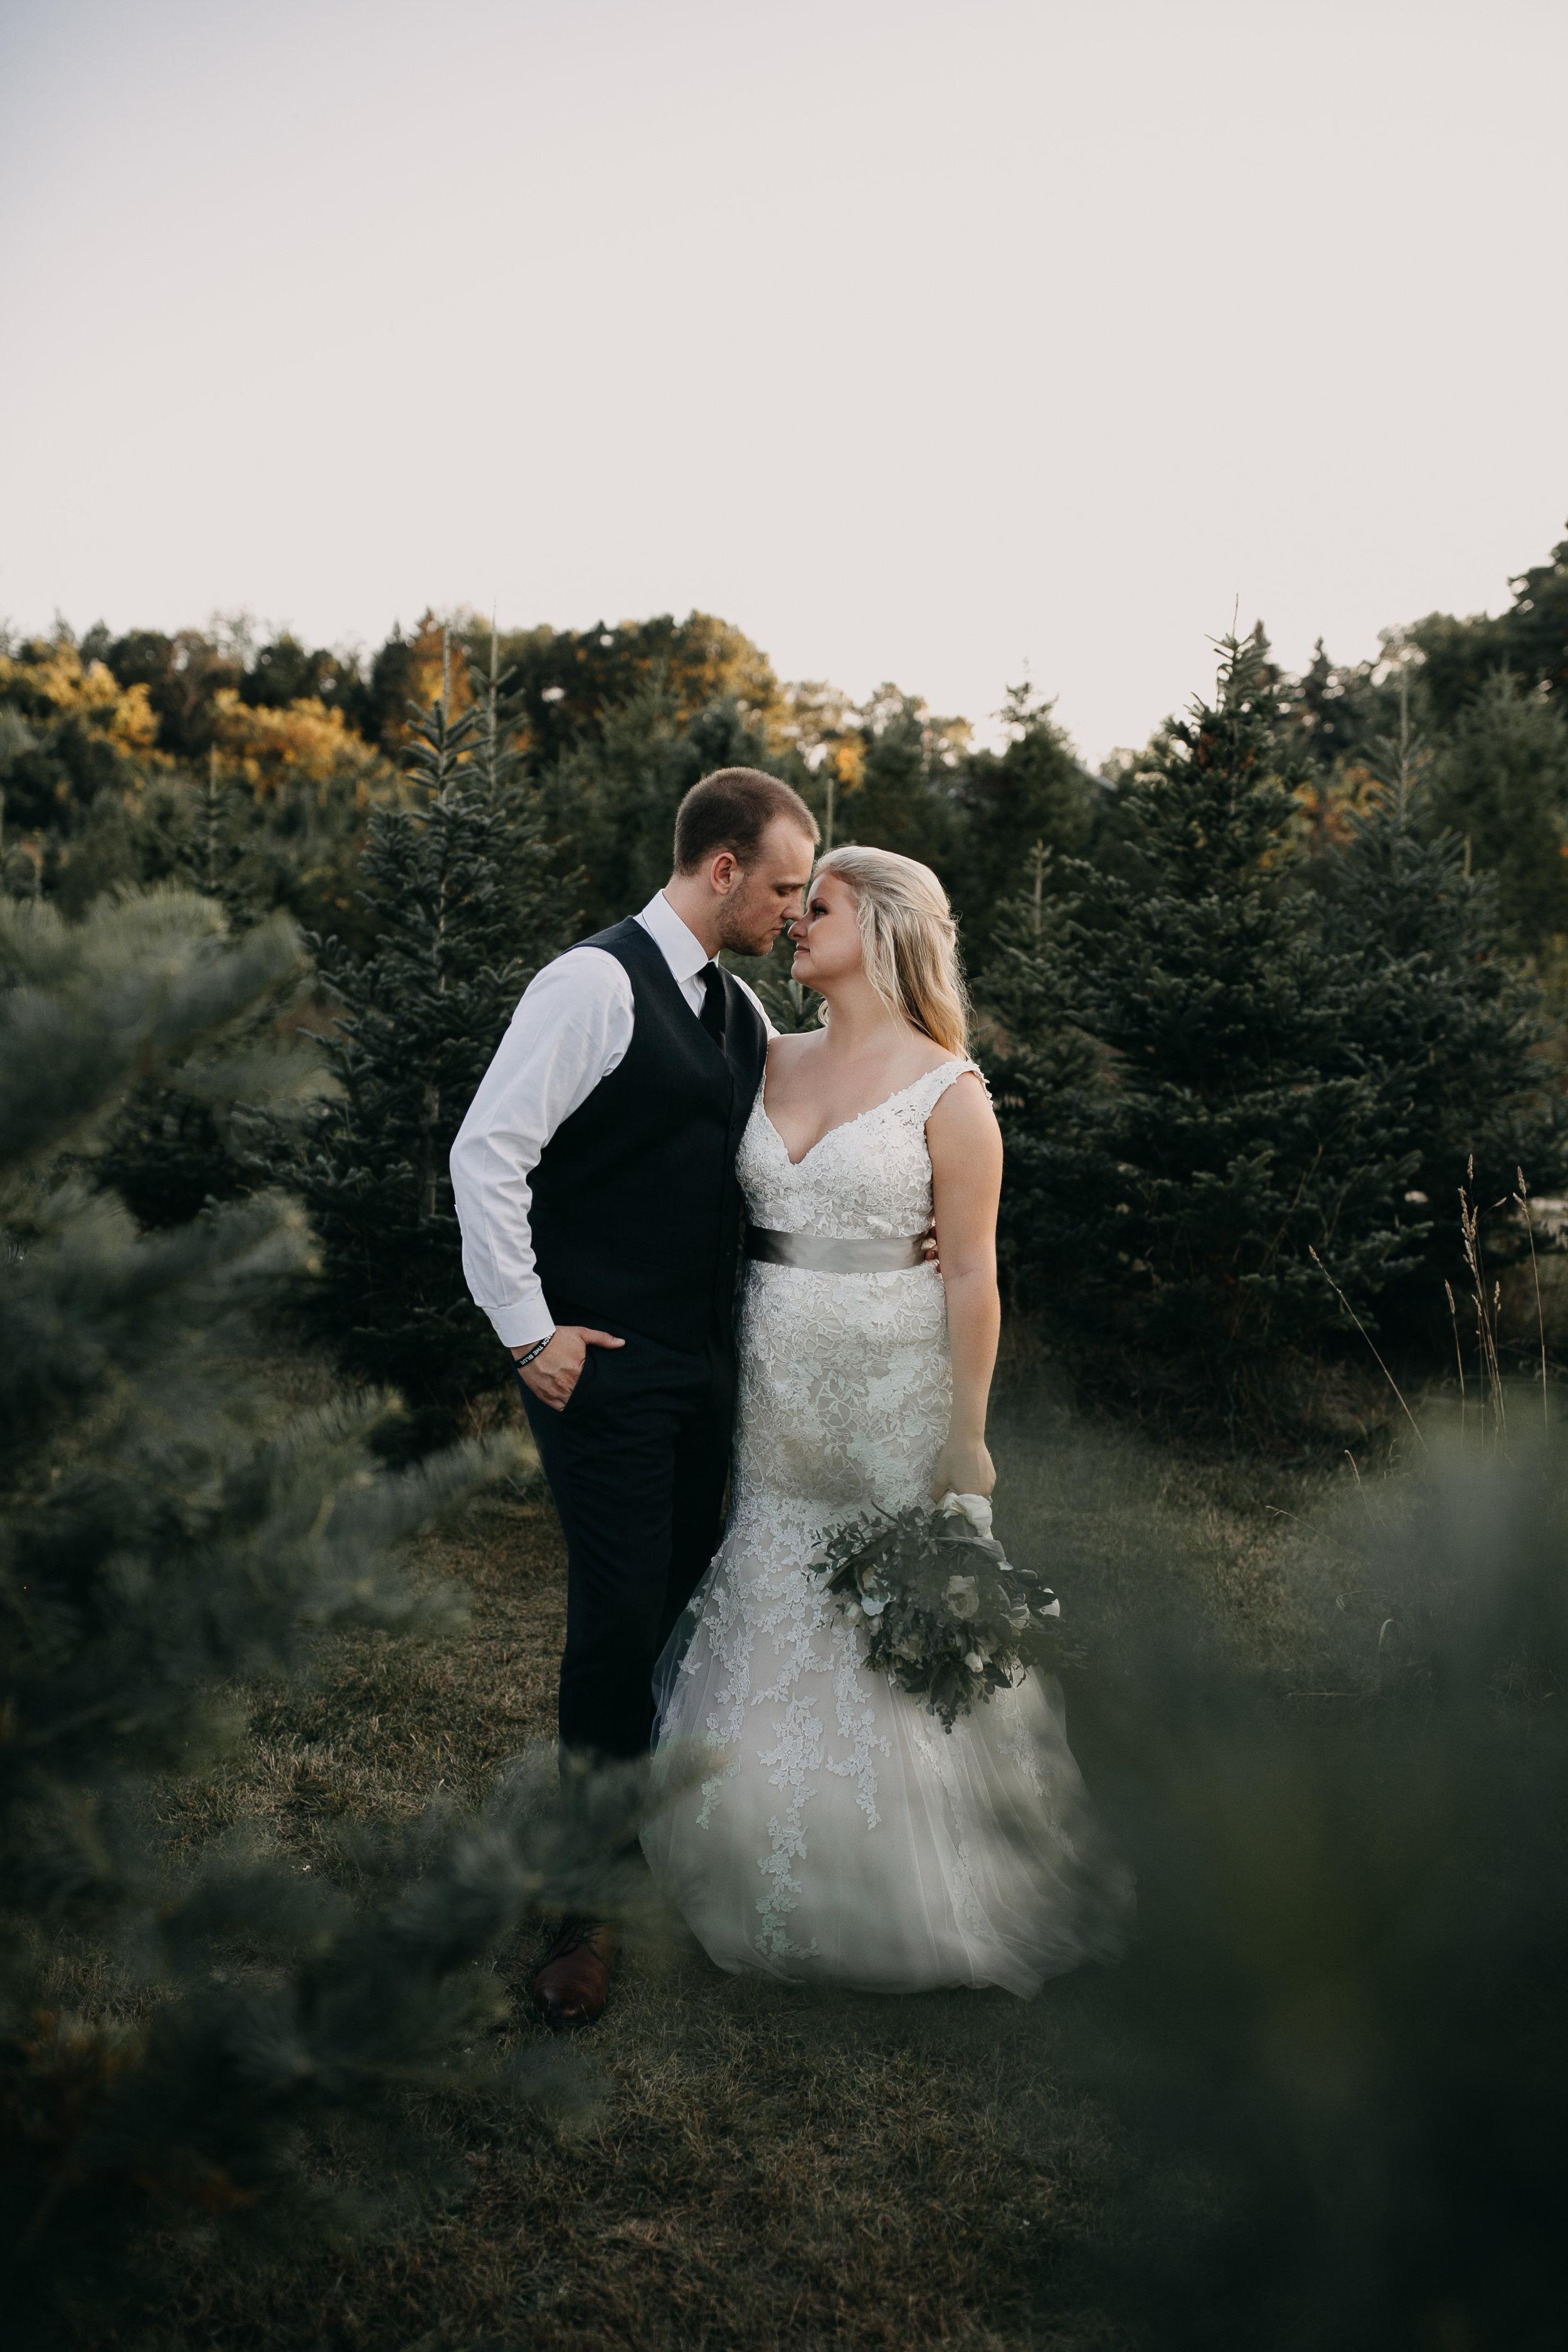 54tree farm wedding.jpg